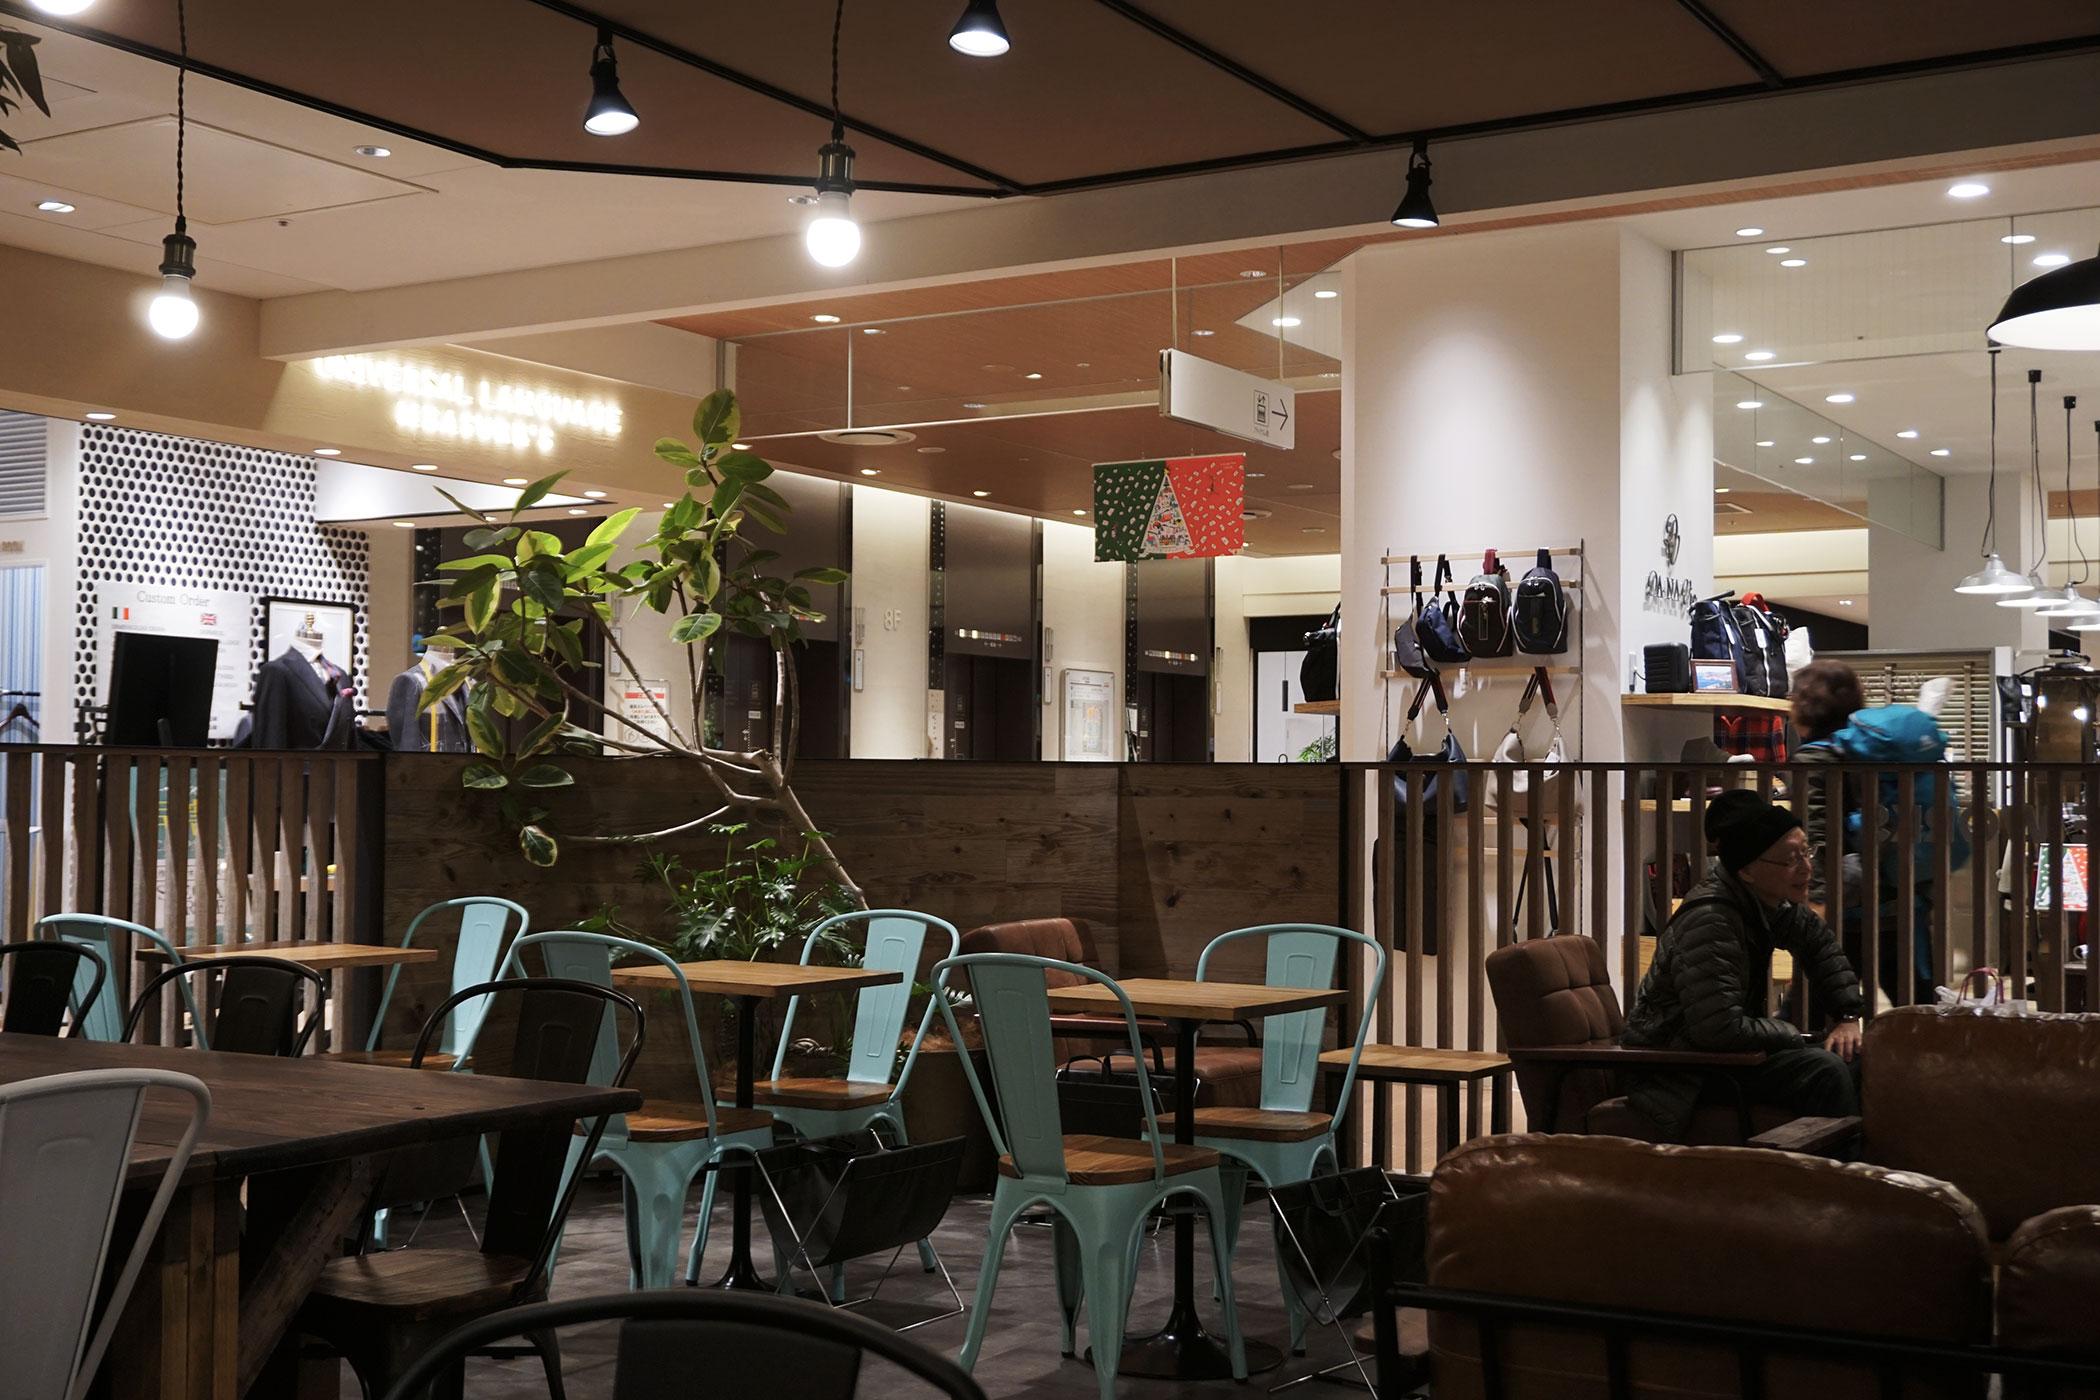 SANWA COFFEE WORKS LUCUA1100 大阪の老舗喫茶がLUCUA1100に新店をオープン